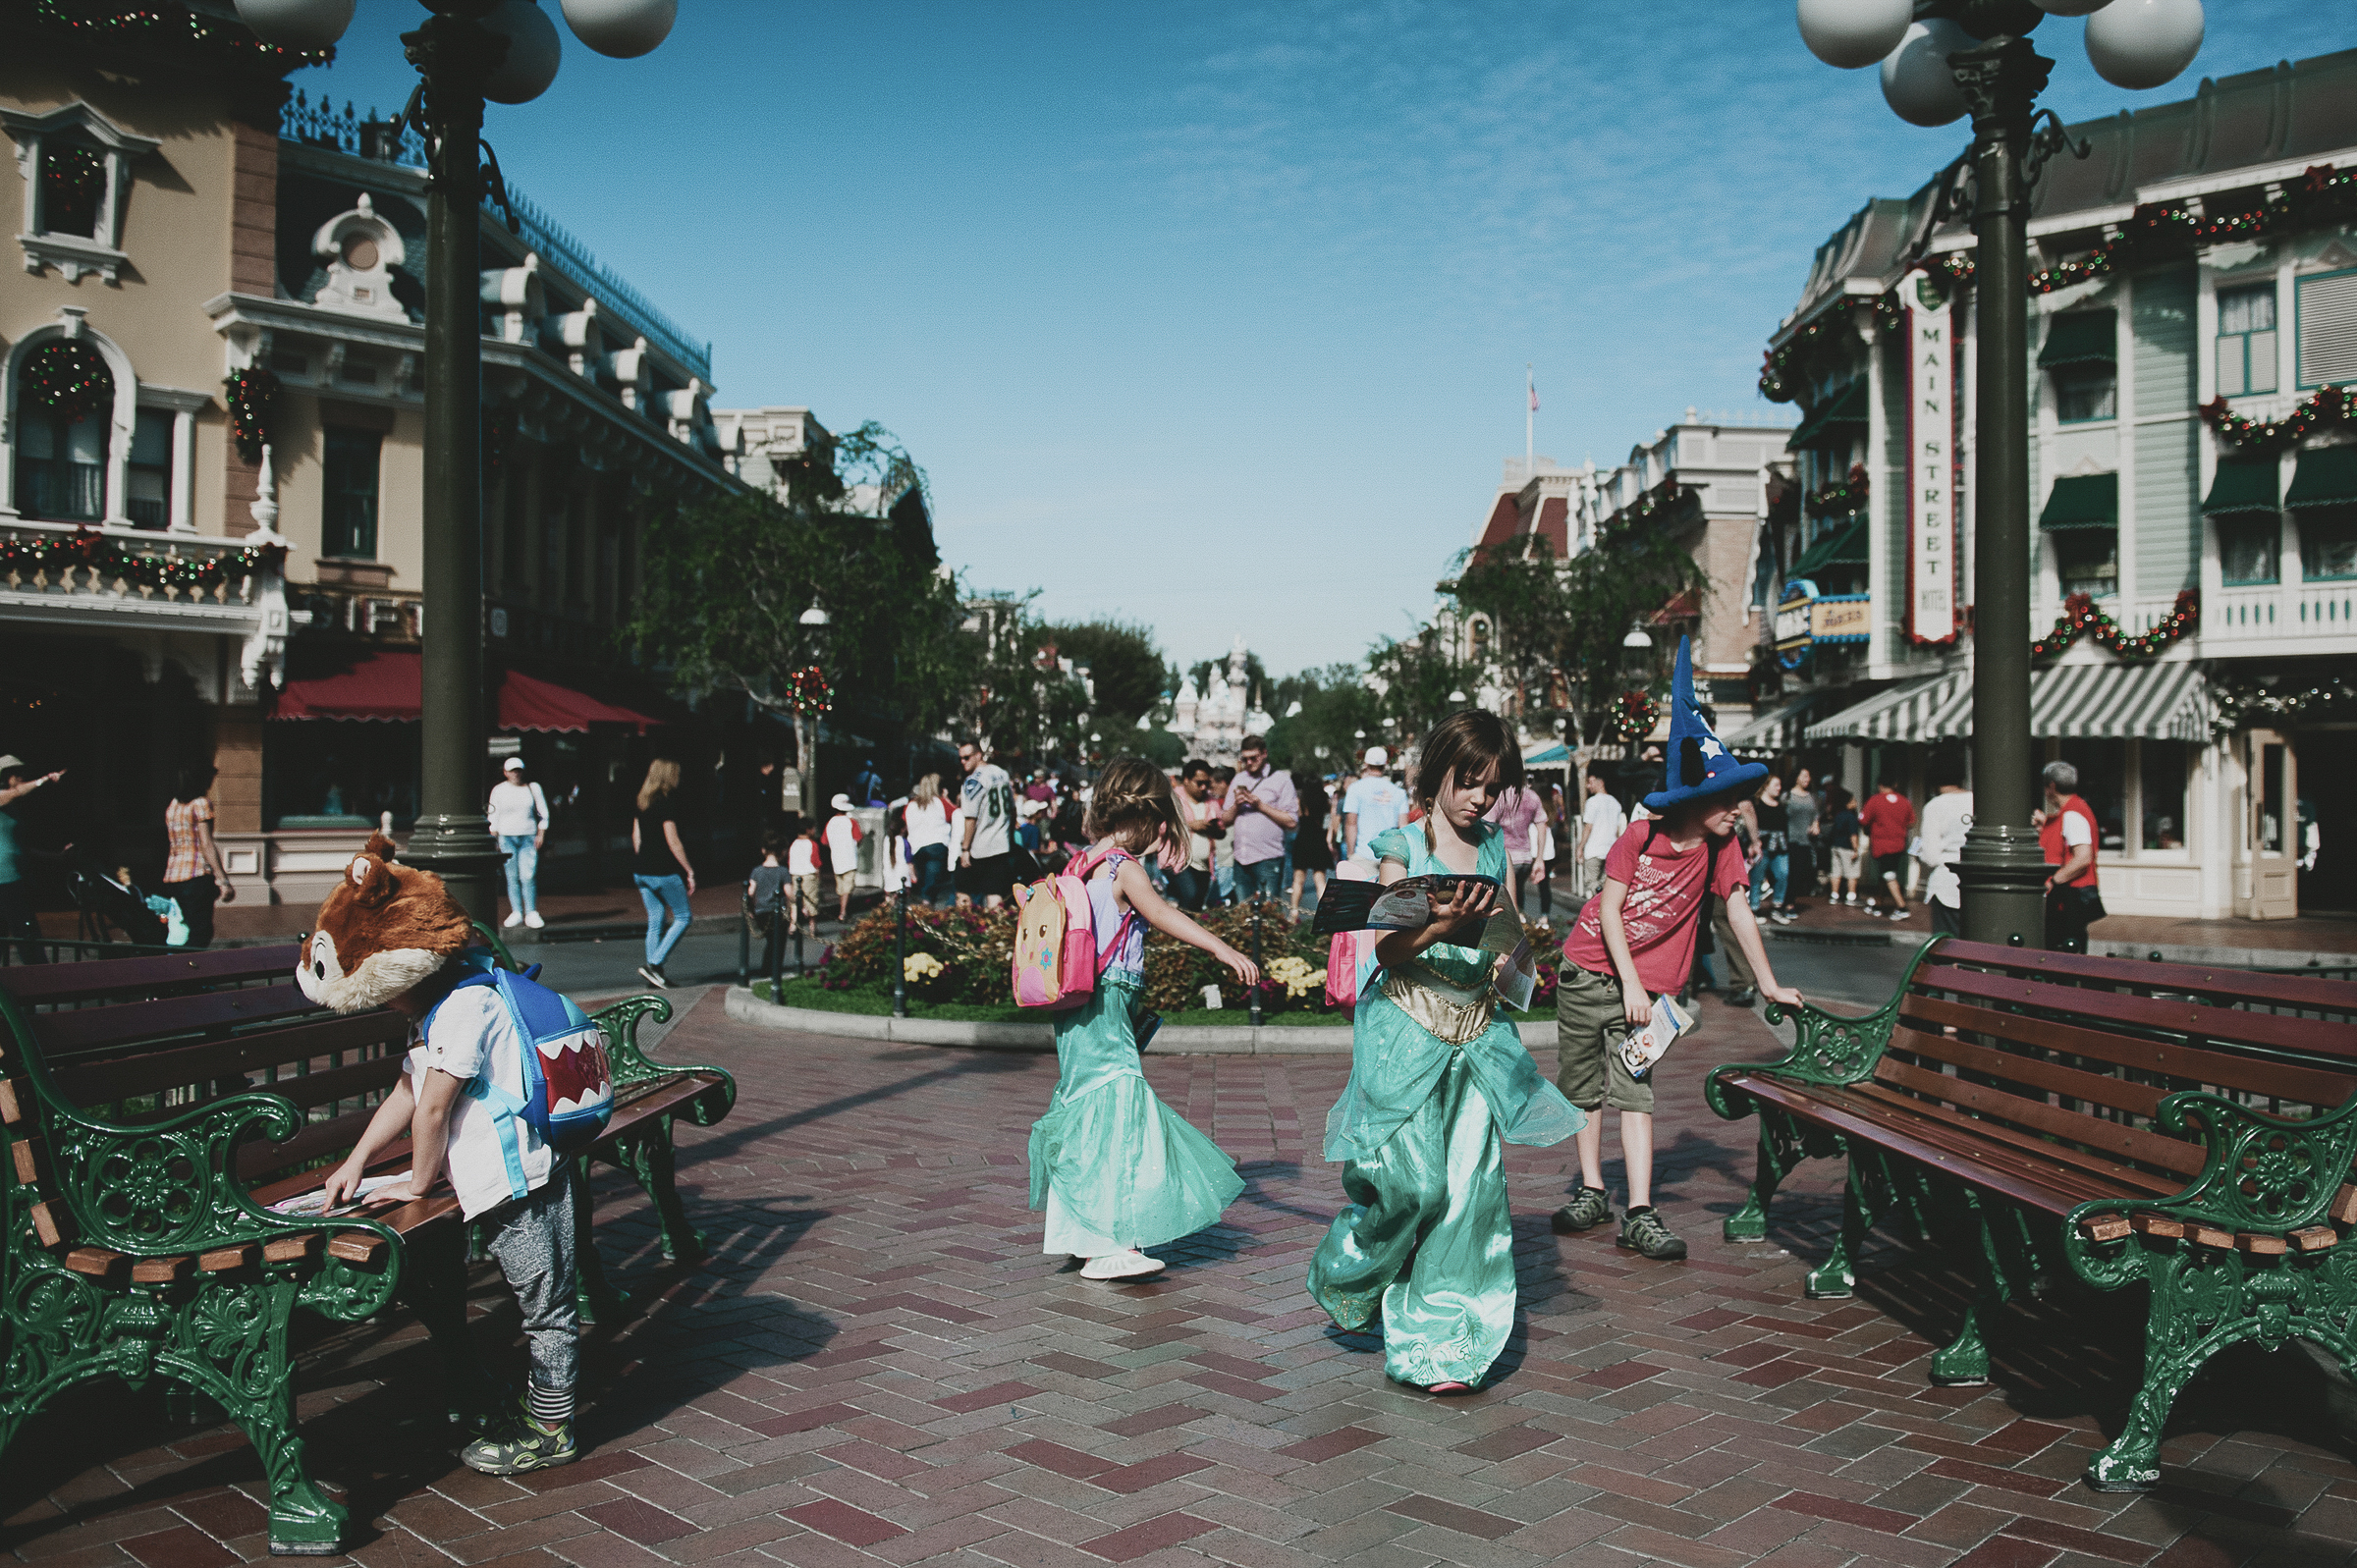 Disneyland-Anaheim-Photographer-6-2.jpg